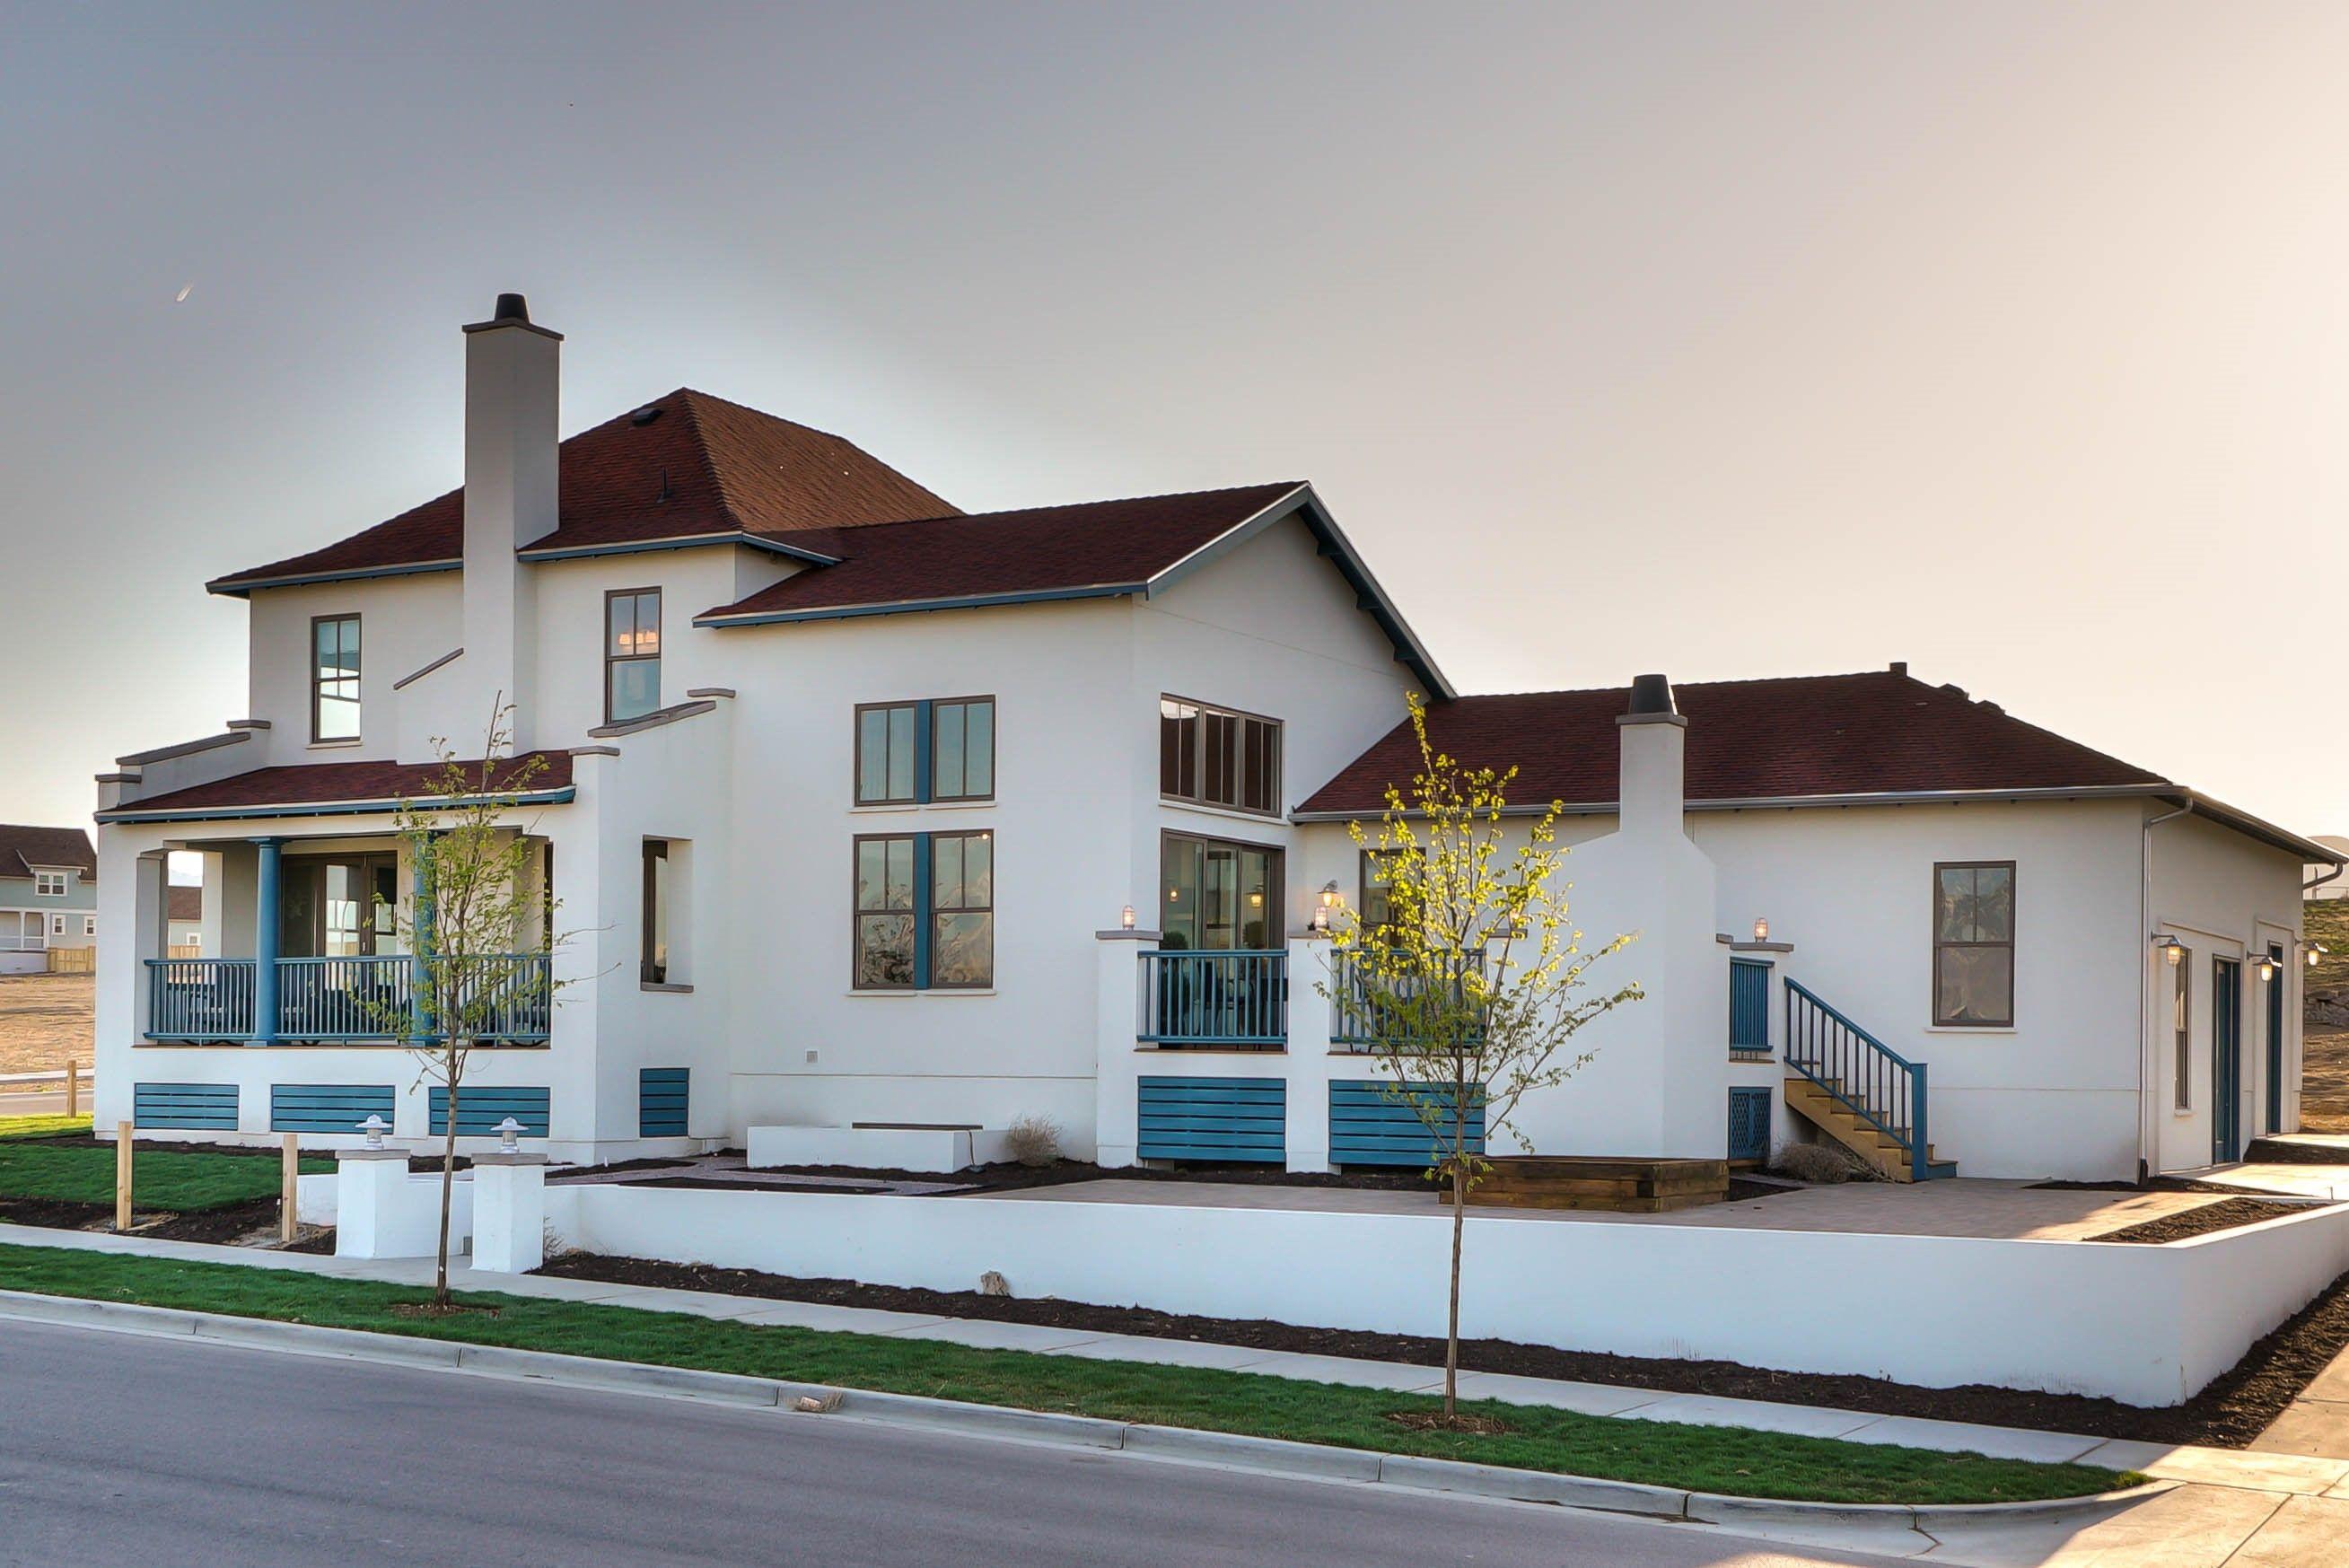 Manufactured Homes In Vancouver Wa Honda Wiring Diagrams Daybreak South Jordan Ut - Homemade Ftempo